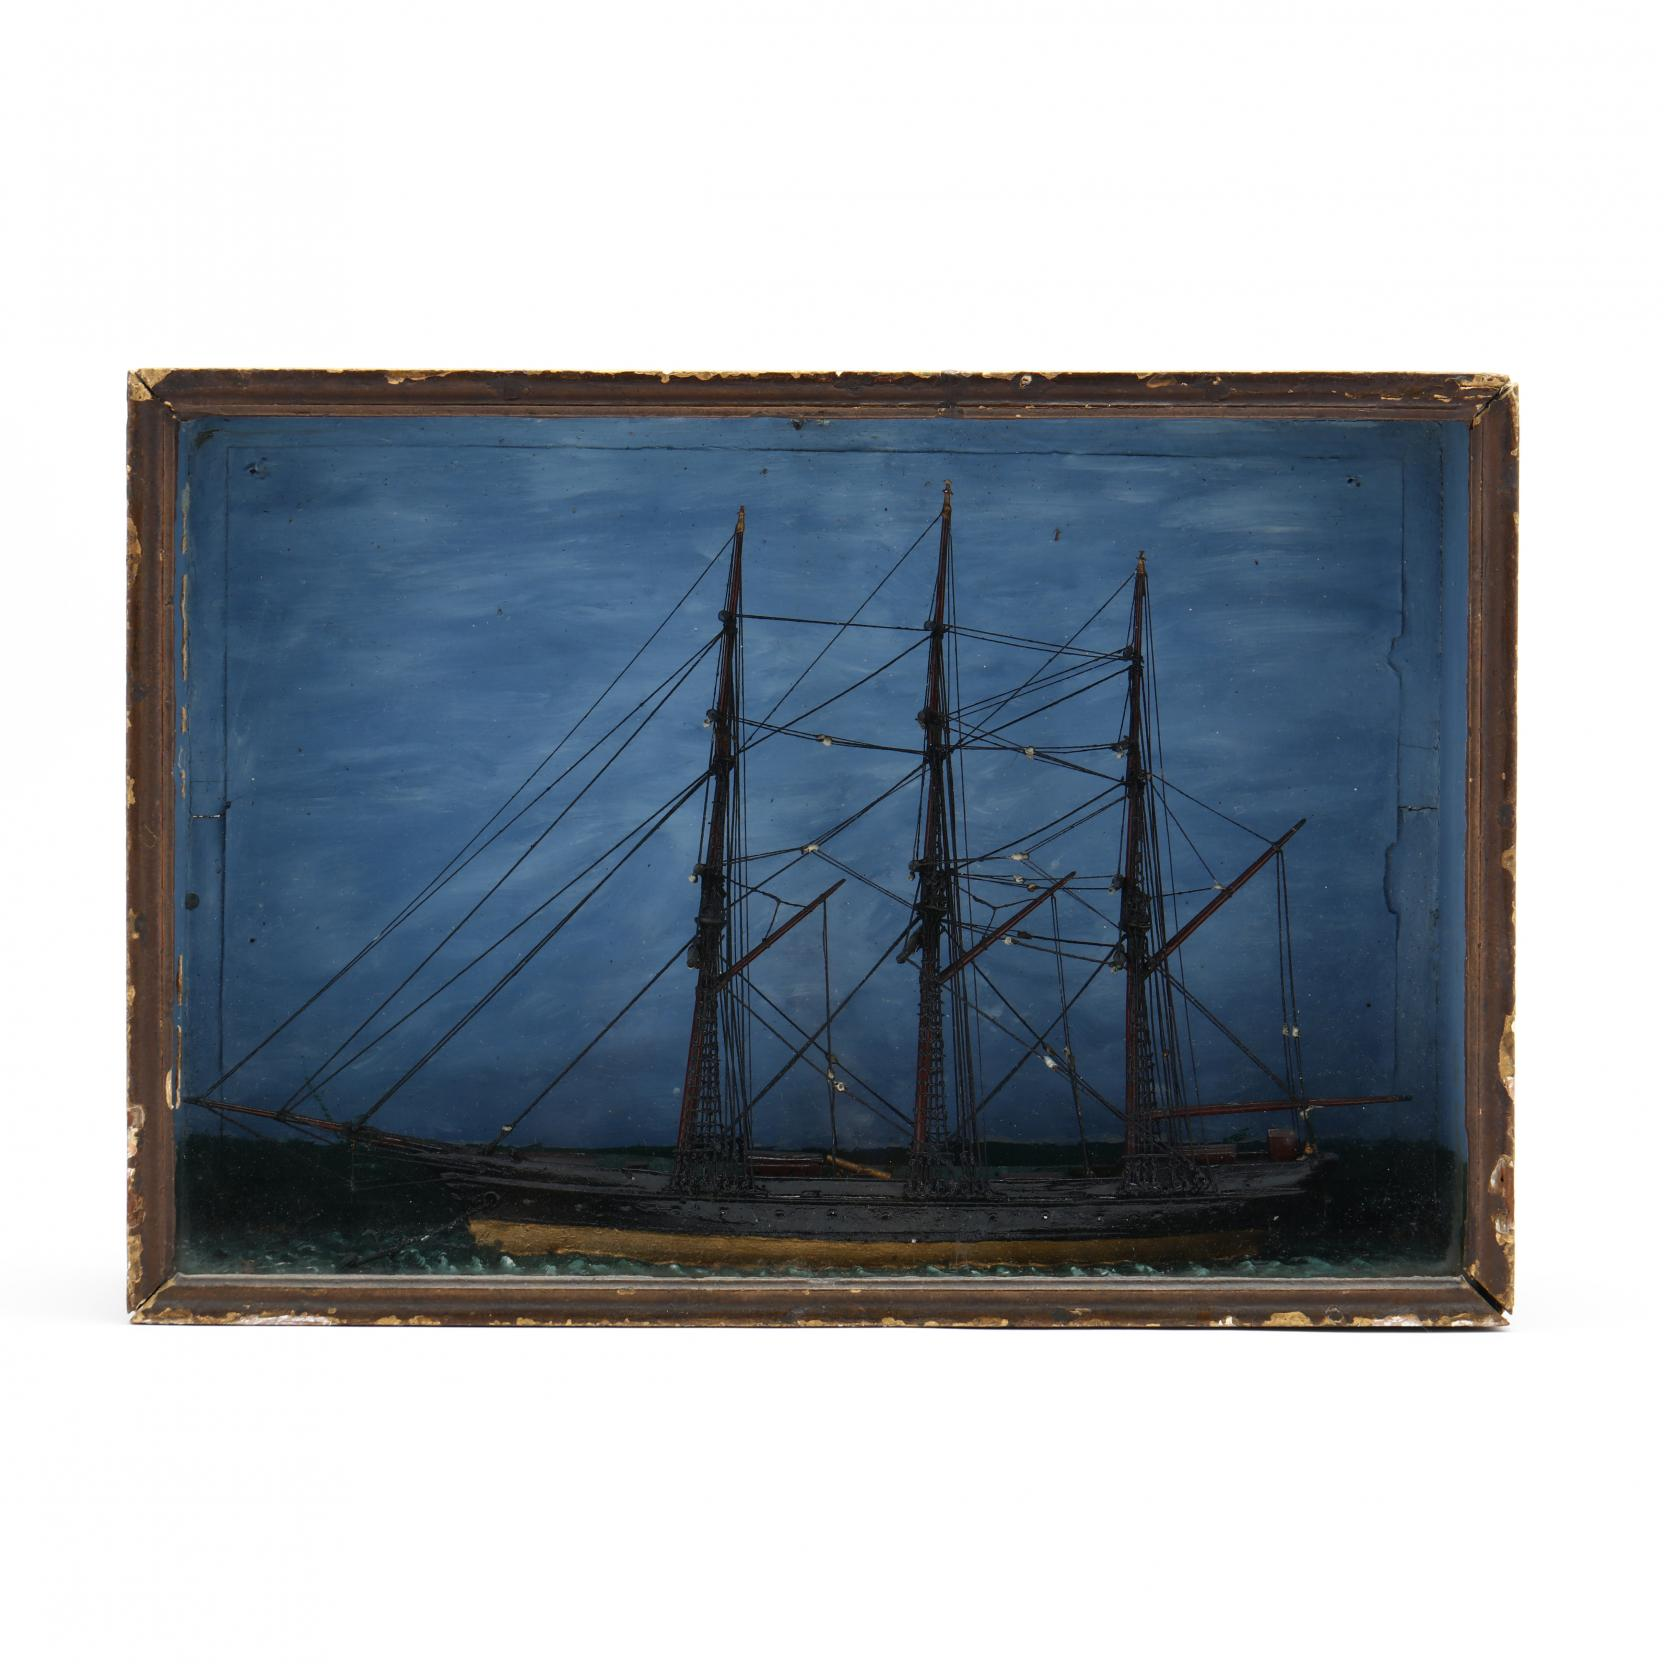 nautical-diorama-of-a-full-rigged-ship